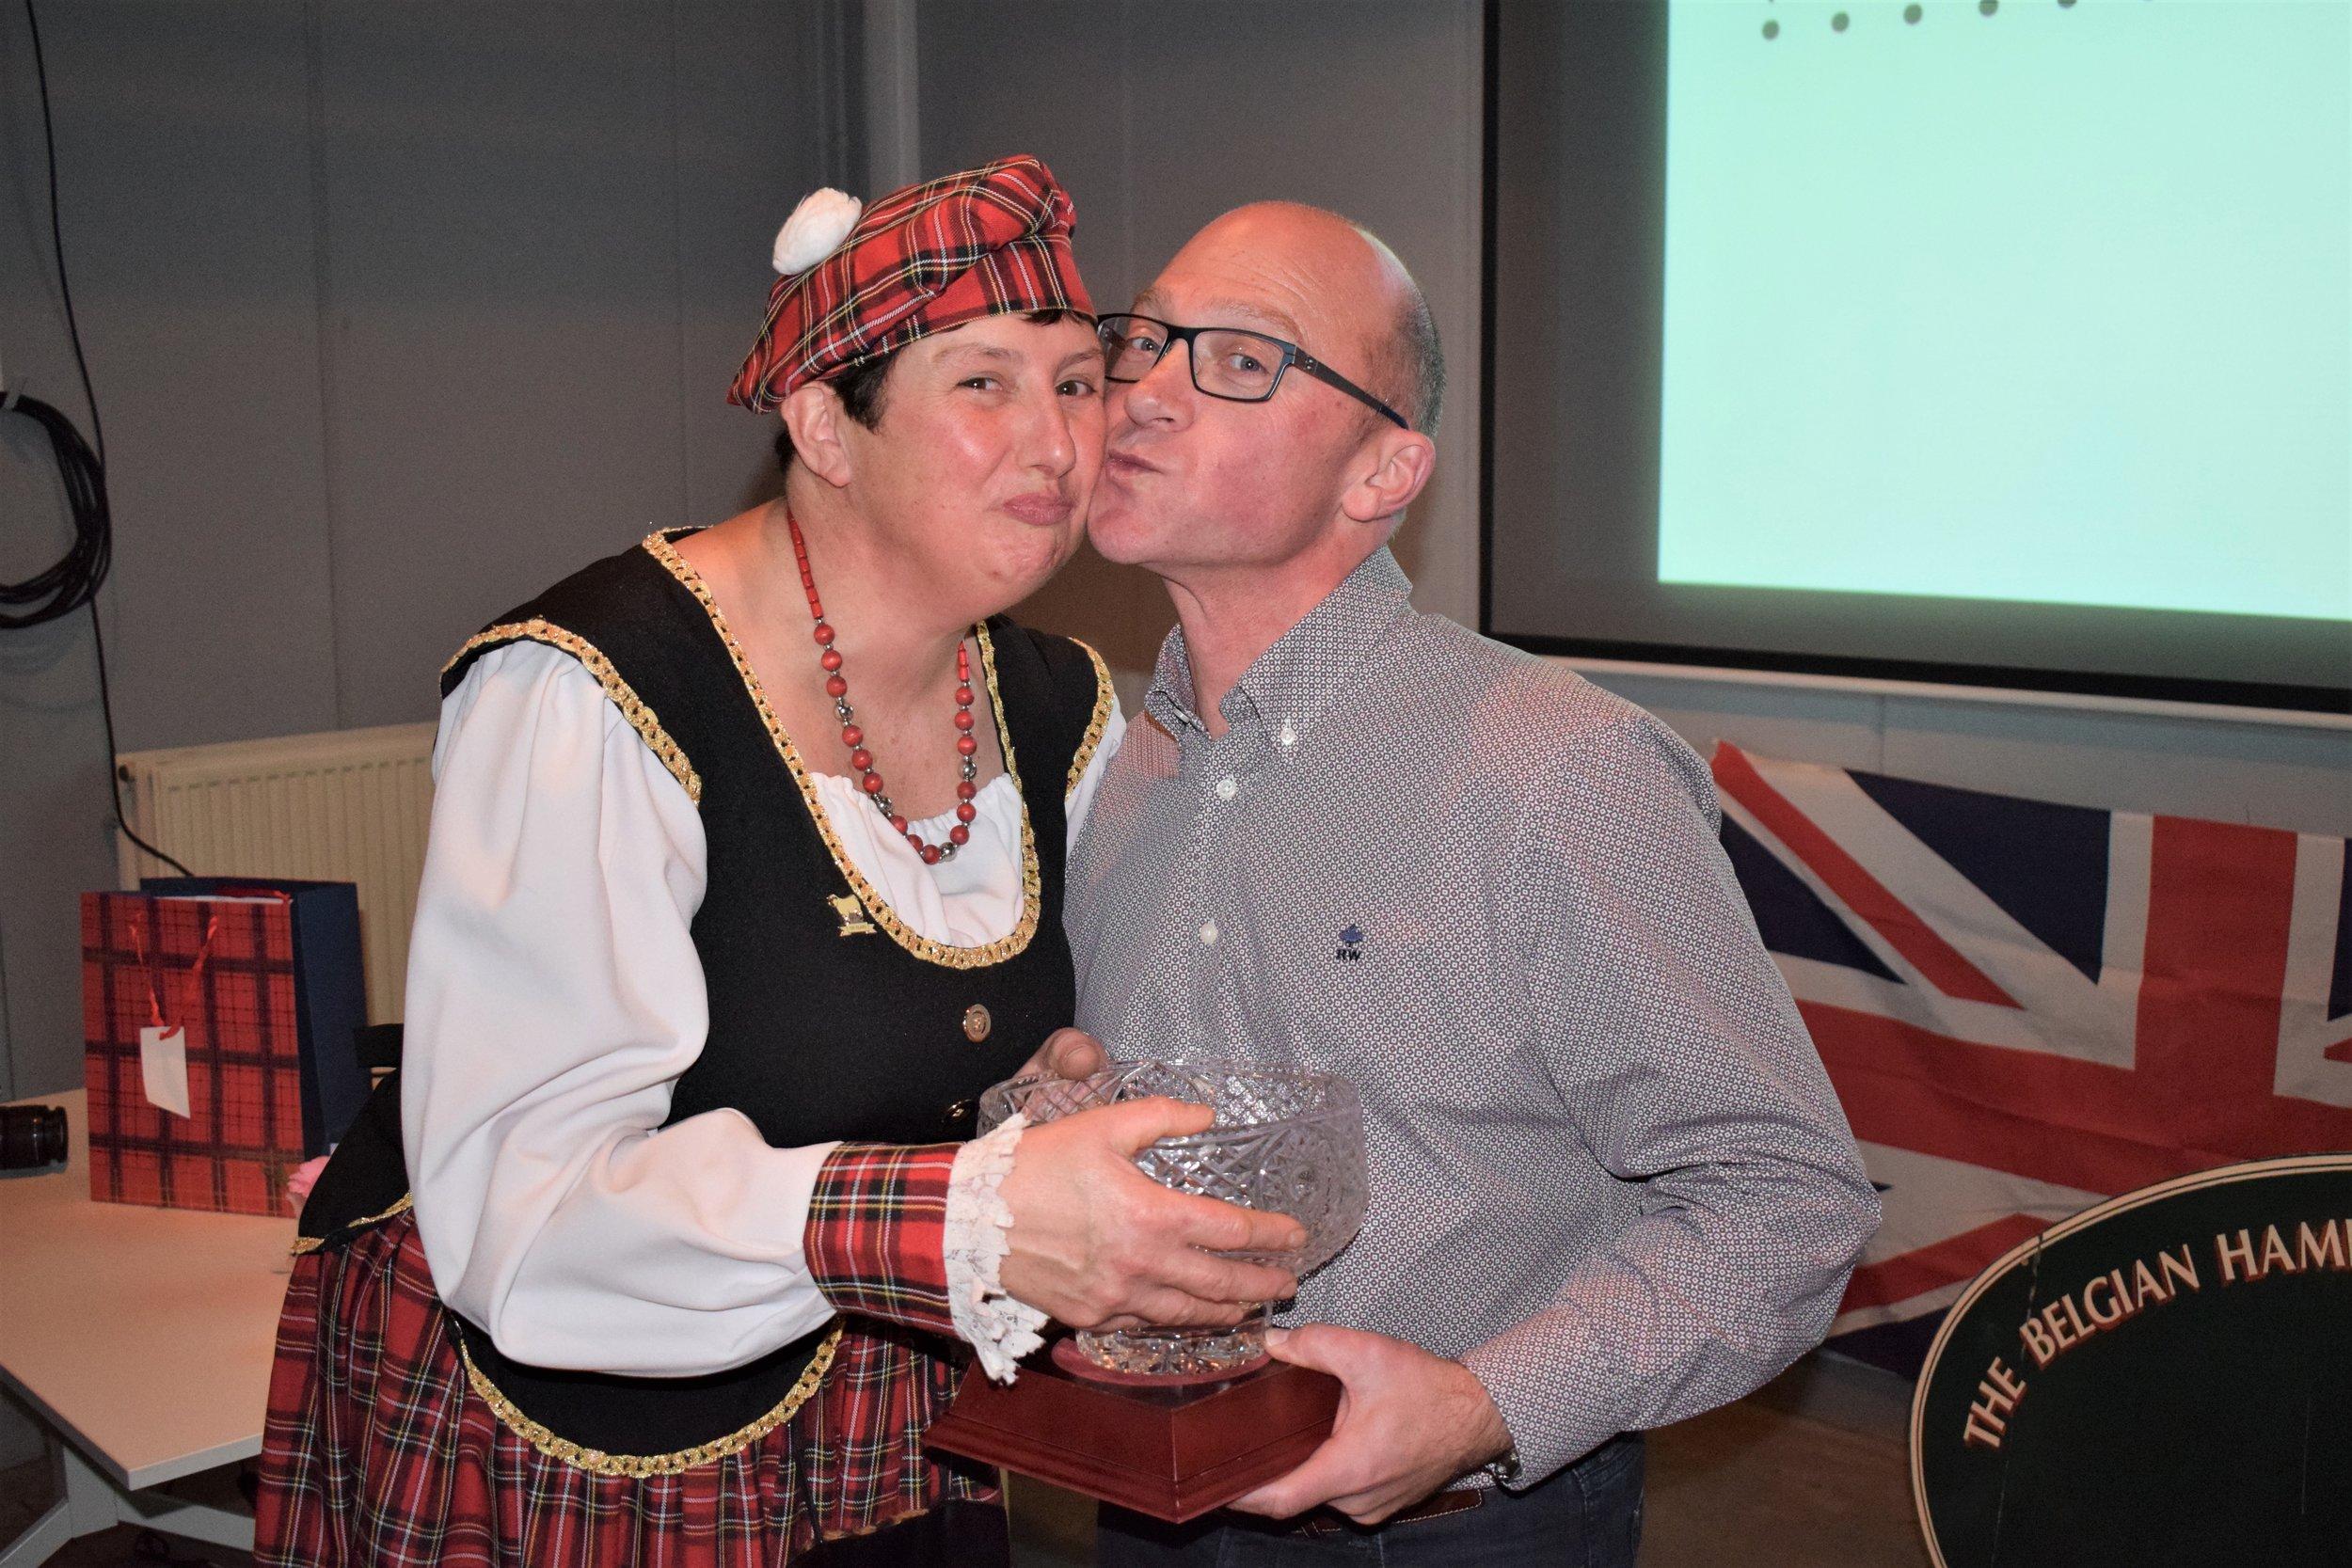 Els Destrebecq - Belgian Club Secretary and also Greenlander Flock with Matias Vanden Bussche, receives Champion Flock Award from Geert Dehaese